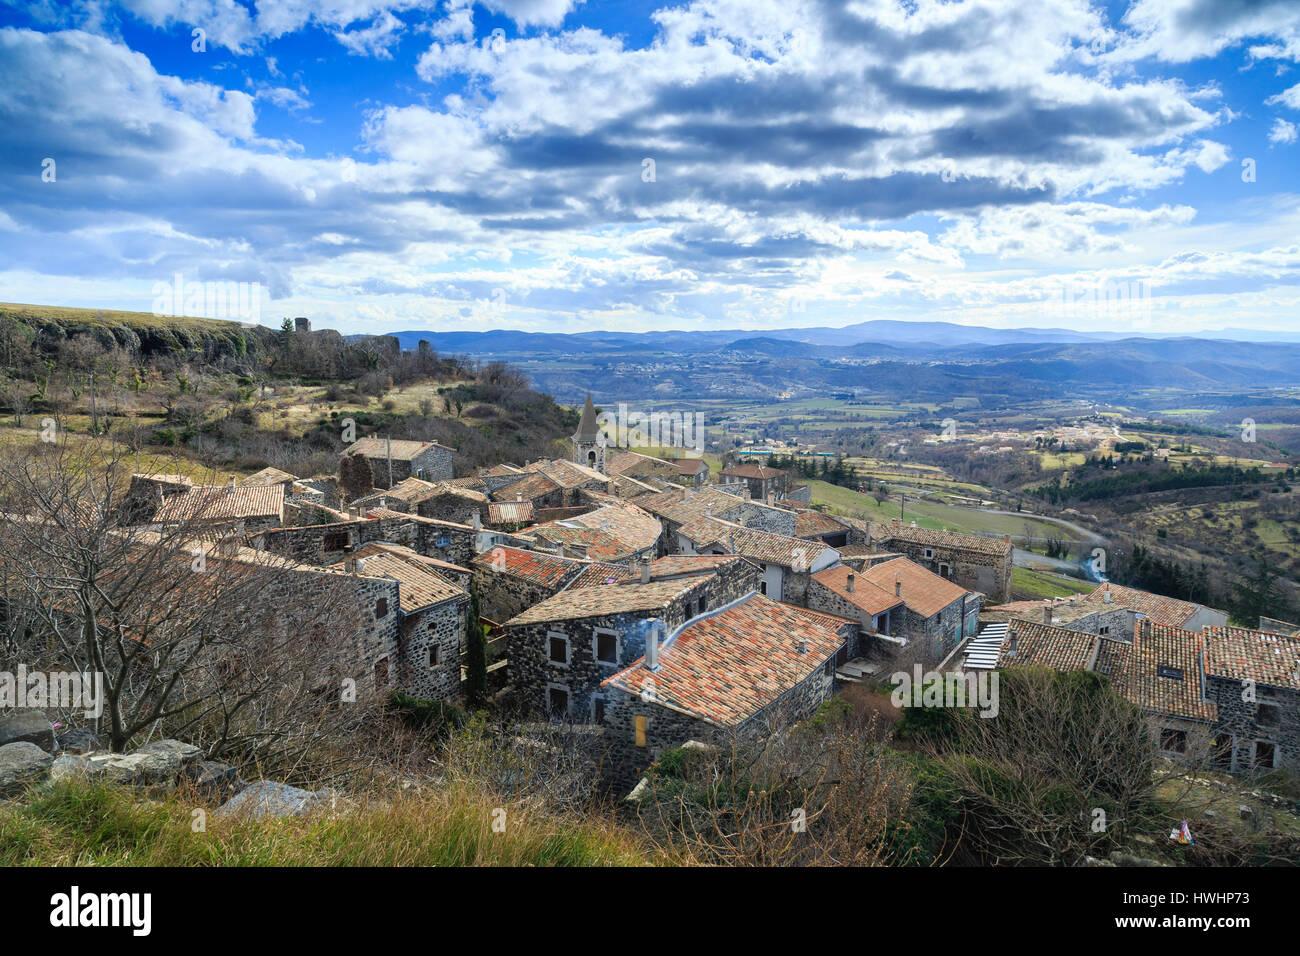 France, Ardeche, Mirabel, the village - Stock Image